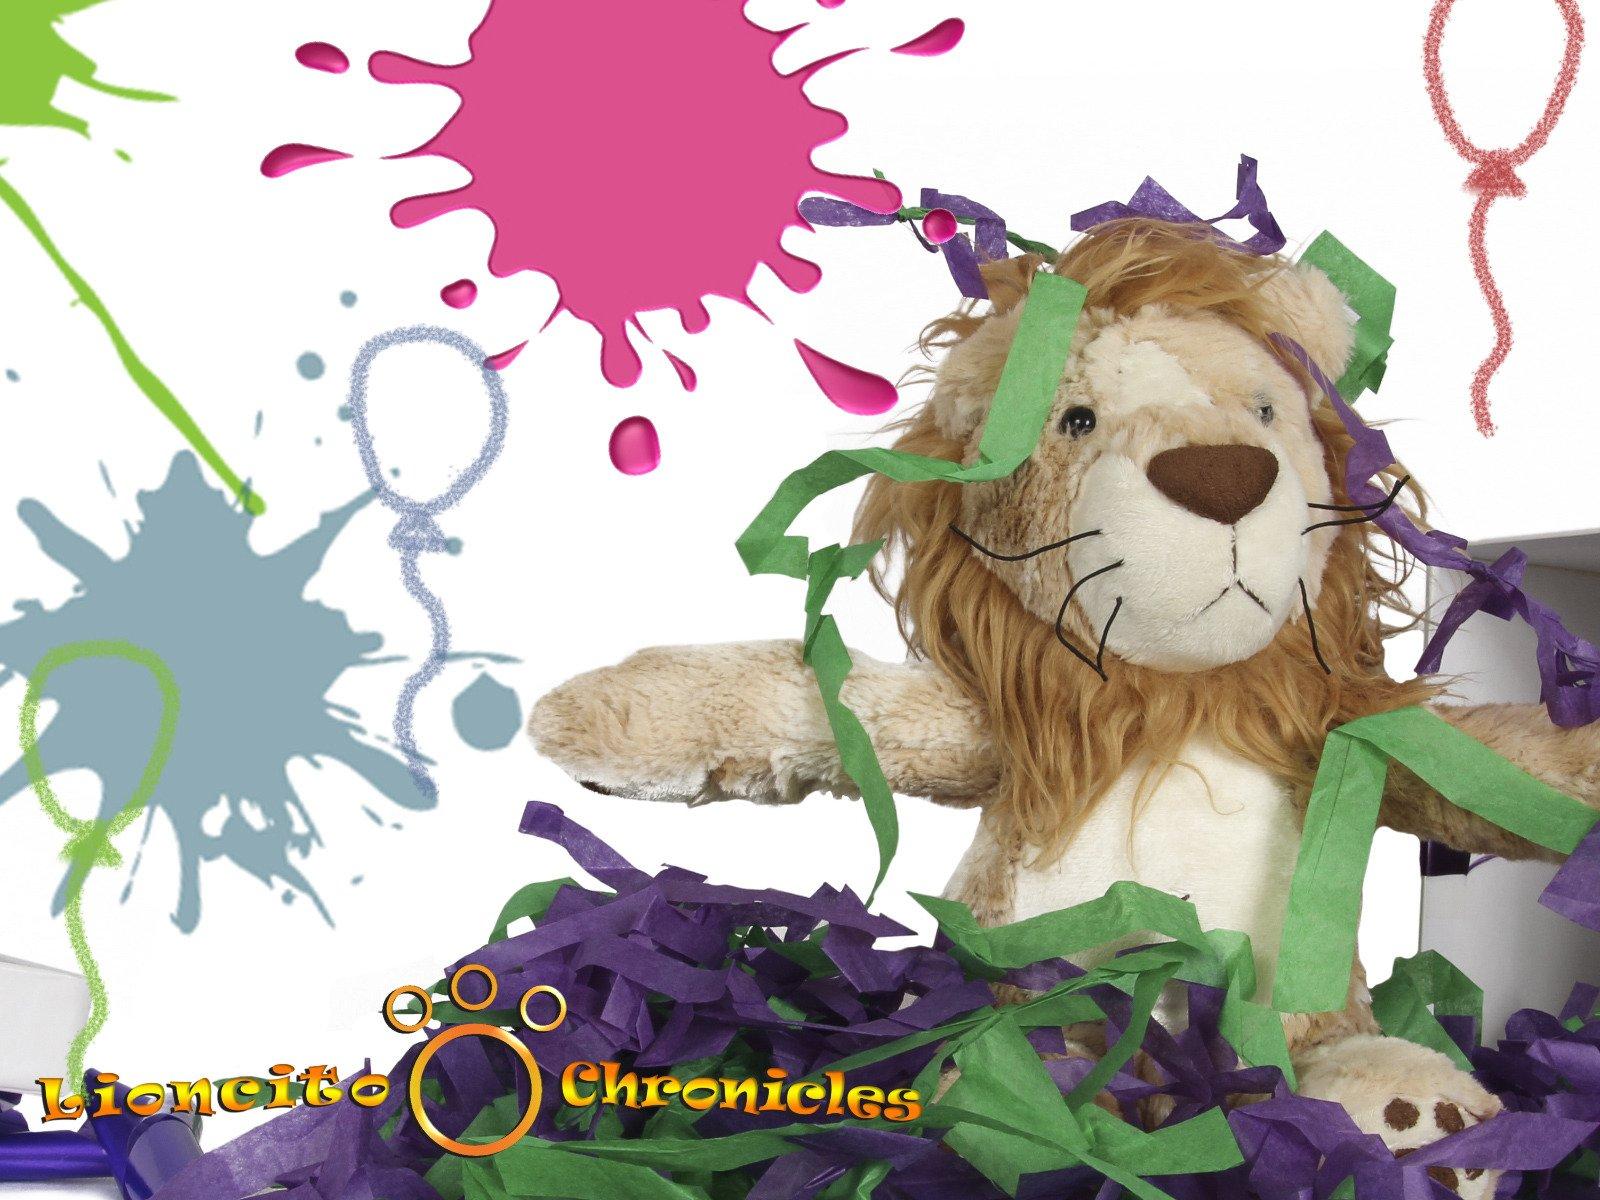 Lioncito Chronicles